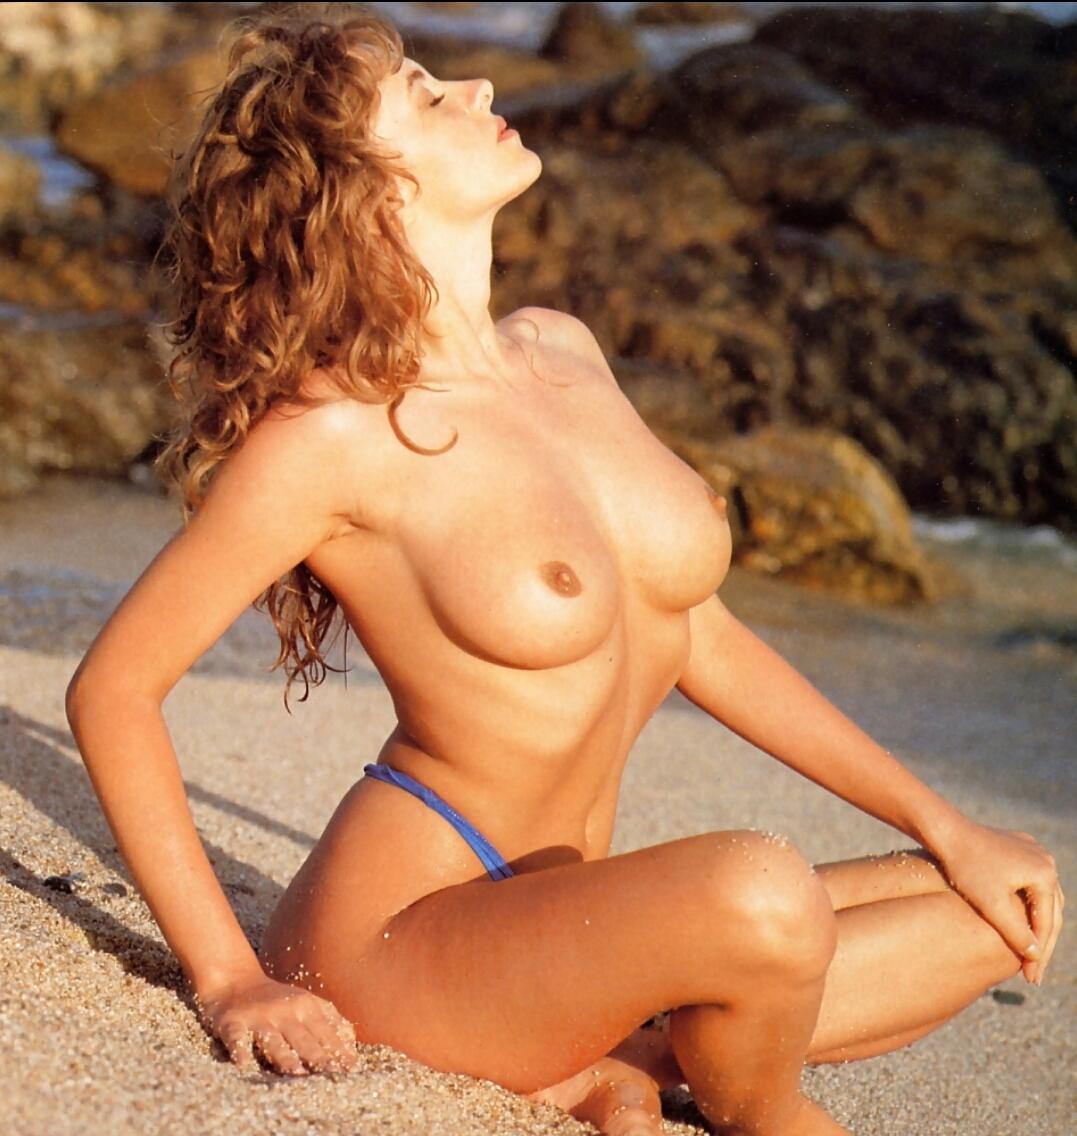 rachel garley nude